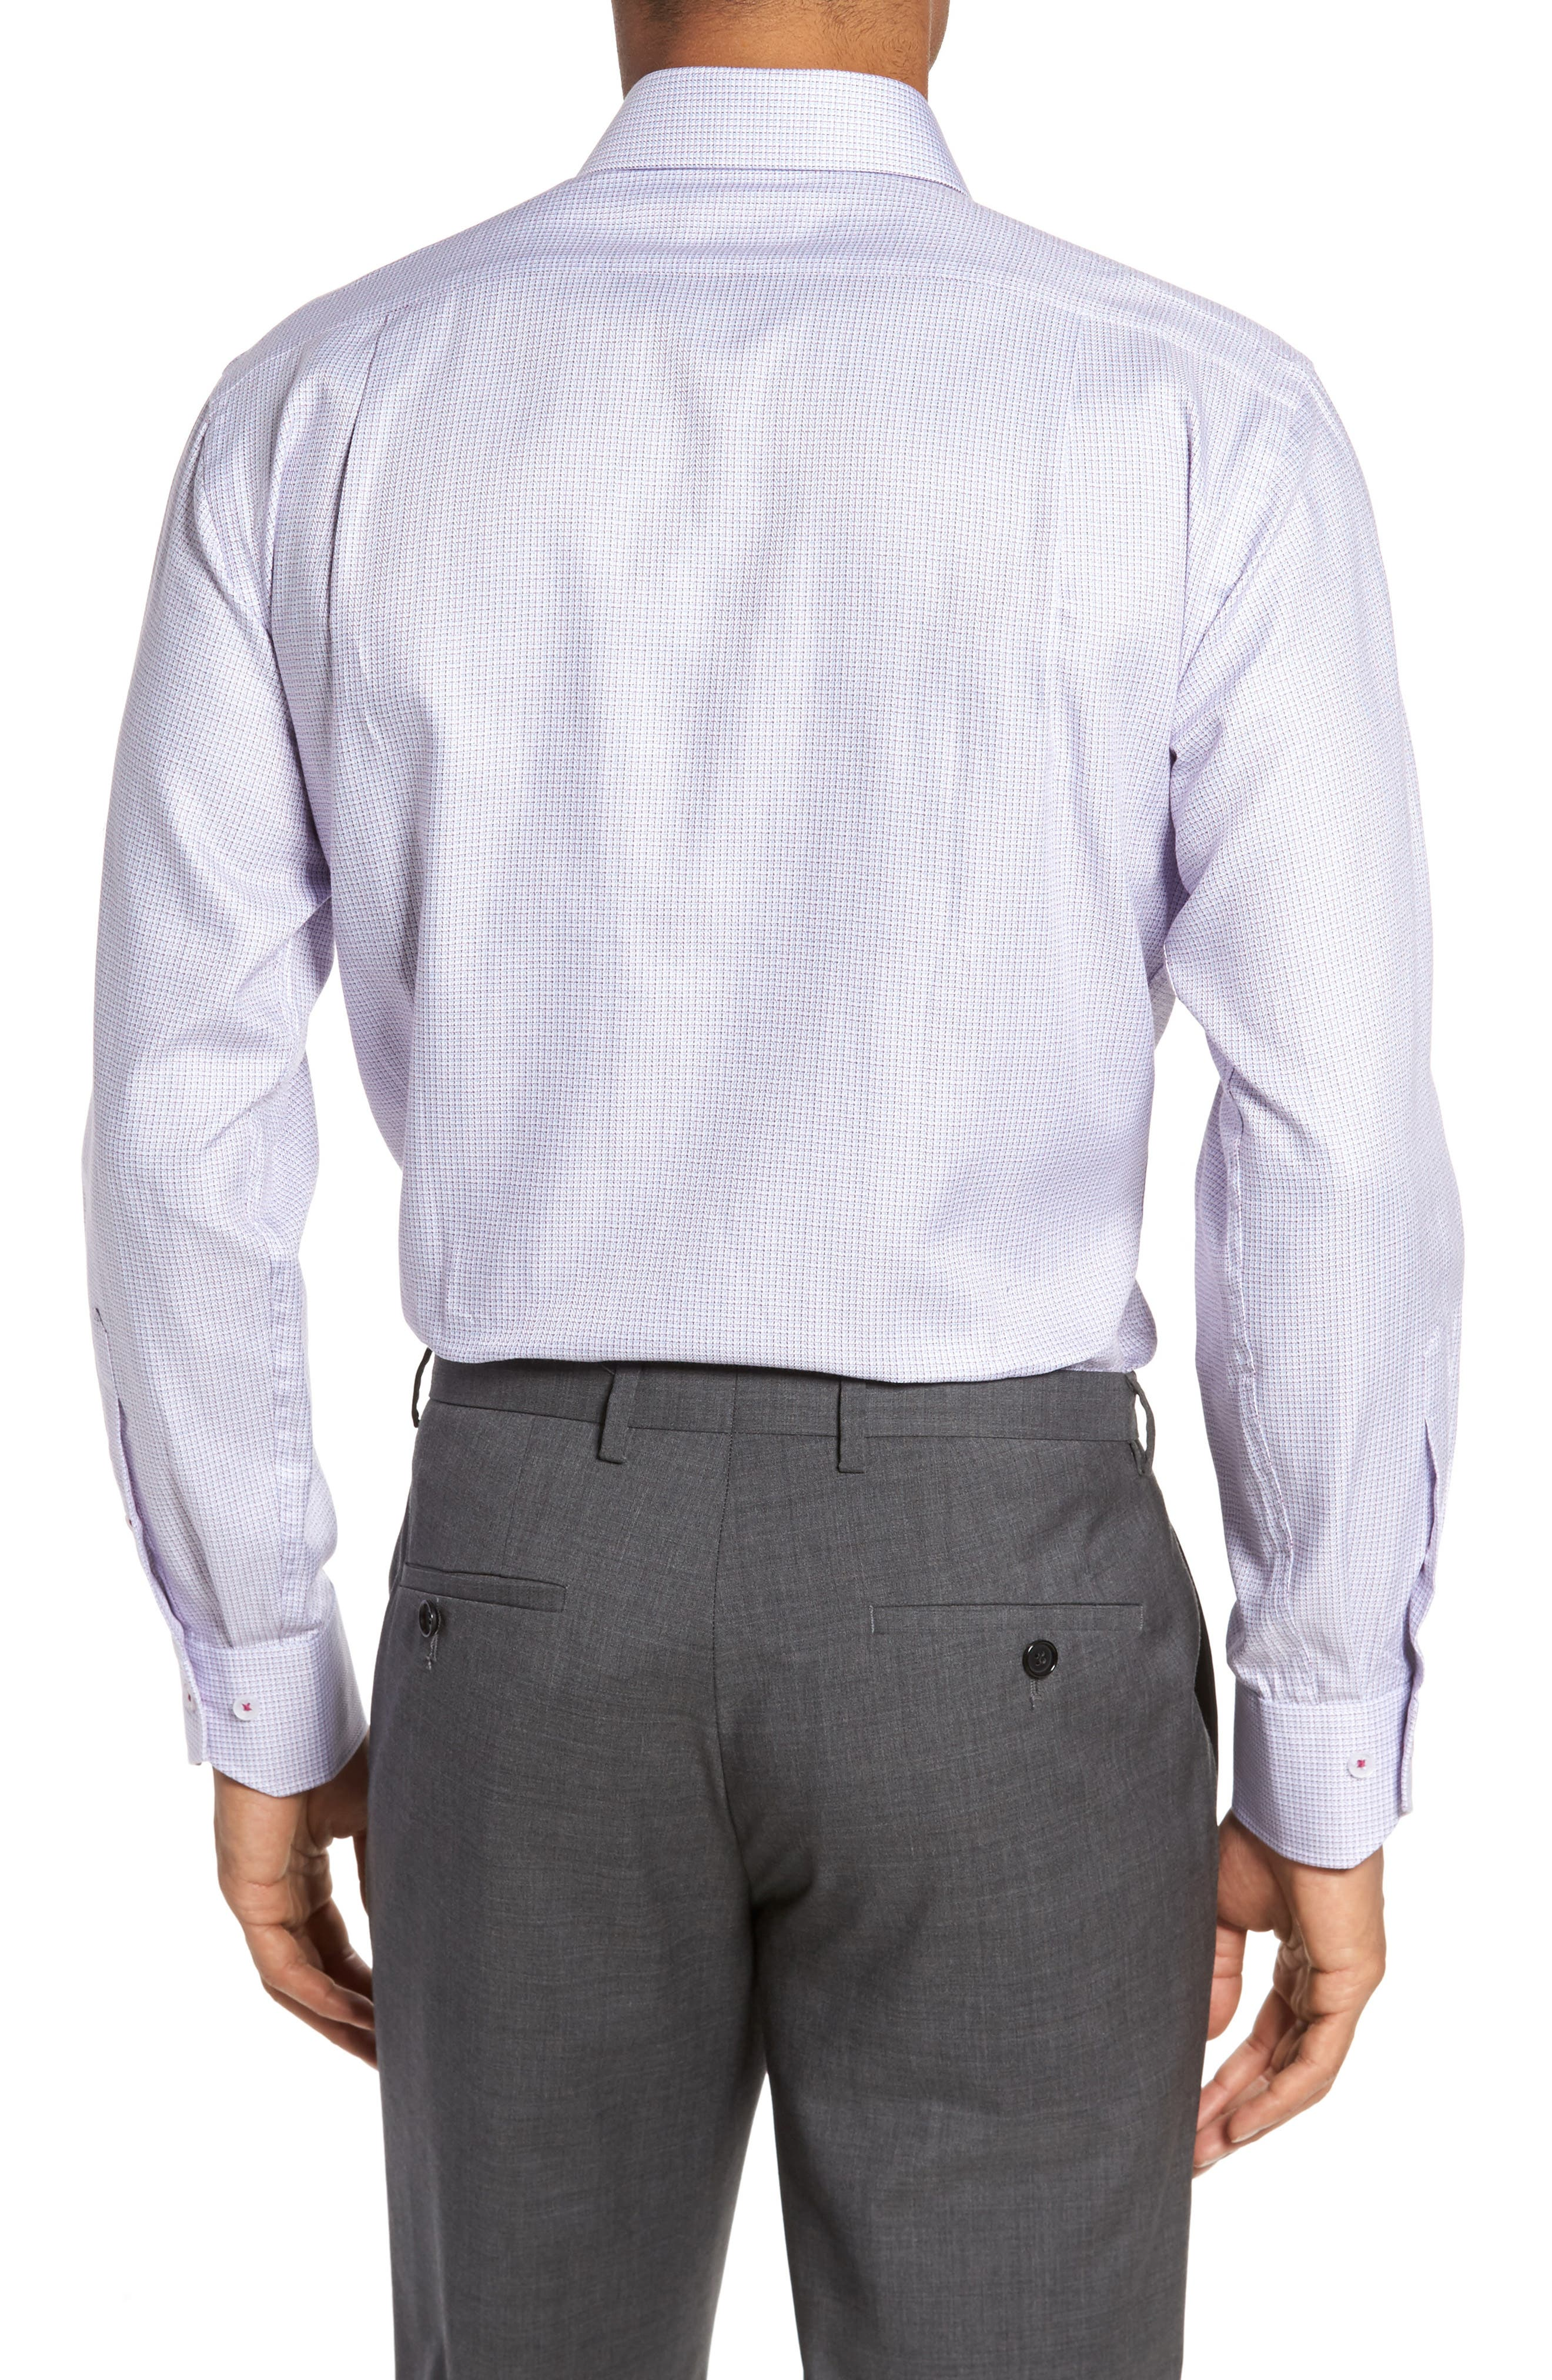 Alternate Image 3  - Lorenzo Uomo Trim Fit Textured Check Dress Shirt